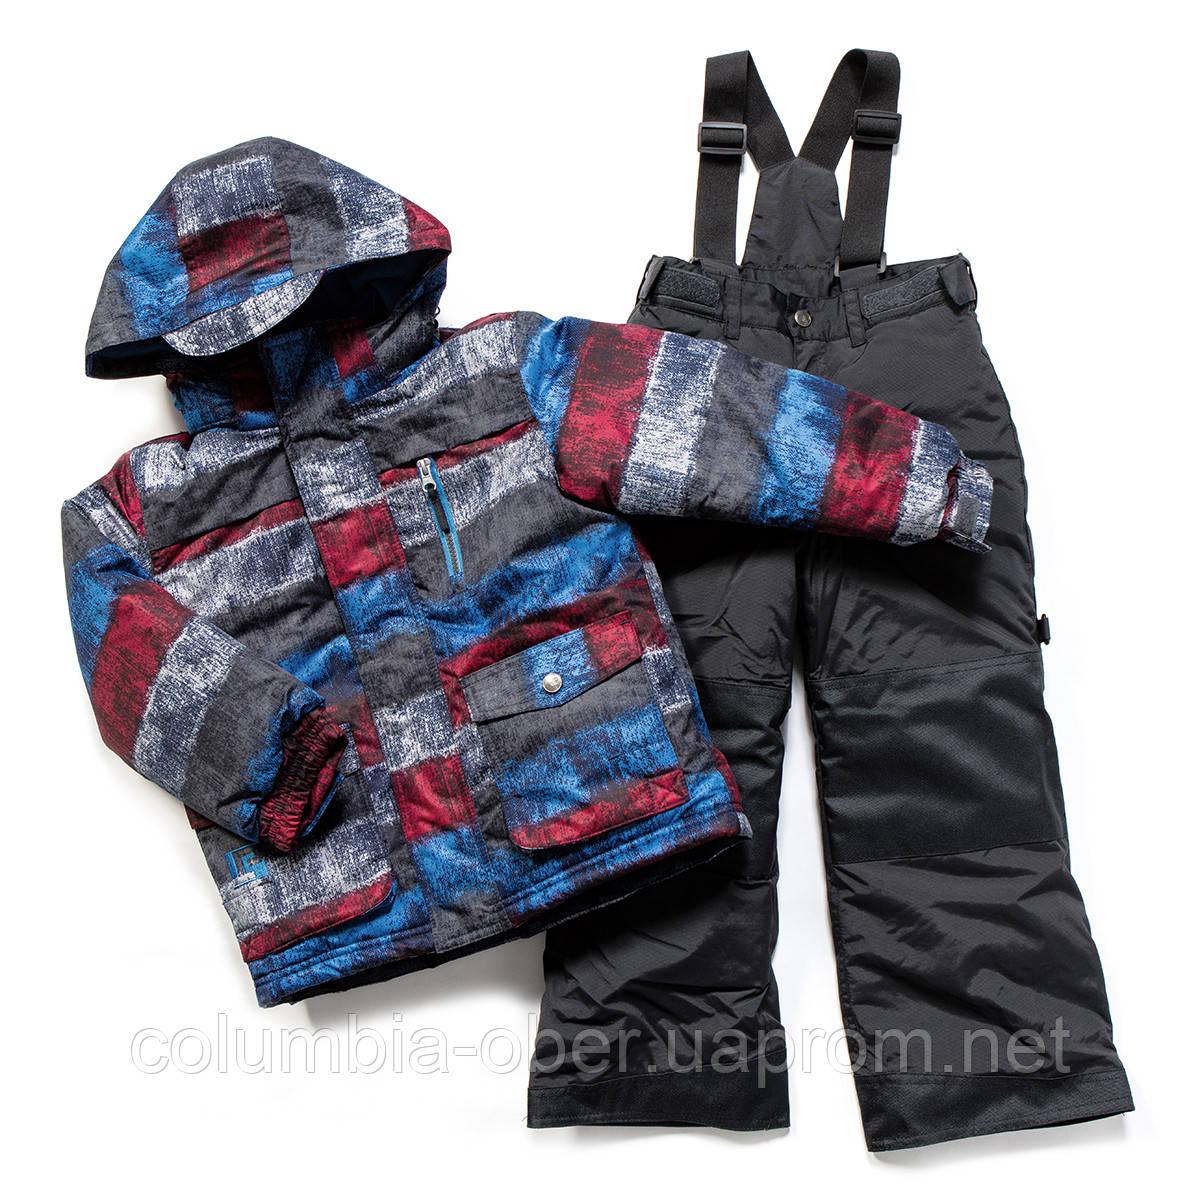 Зимний костюм для мальчика PELUCHE F17 M 63 EG Red Pepper / Deep Grey. Размеры 96-128.